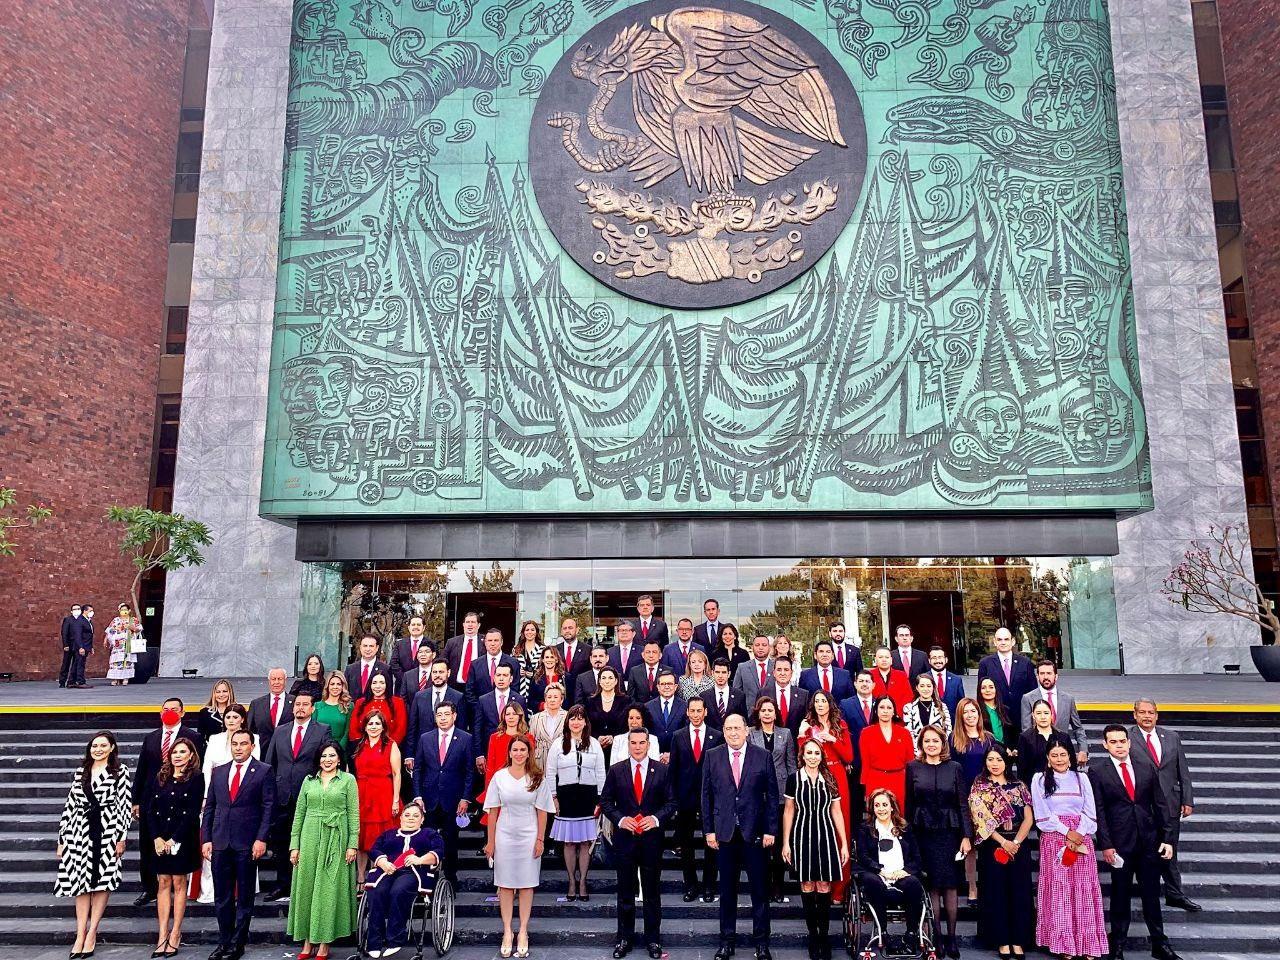 Negociación de presupuesto será prioridad para reactivar económicamente a México: Blanca Alcalá